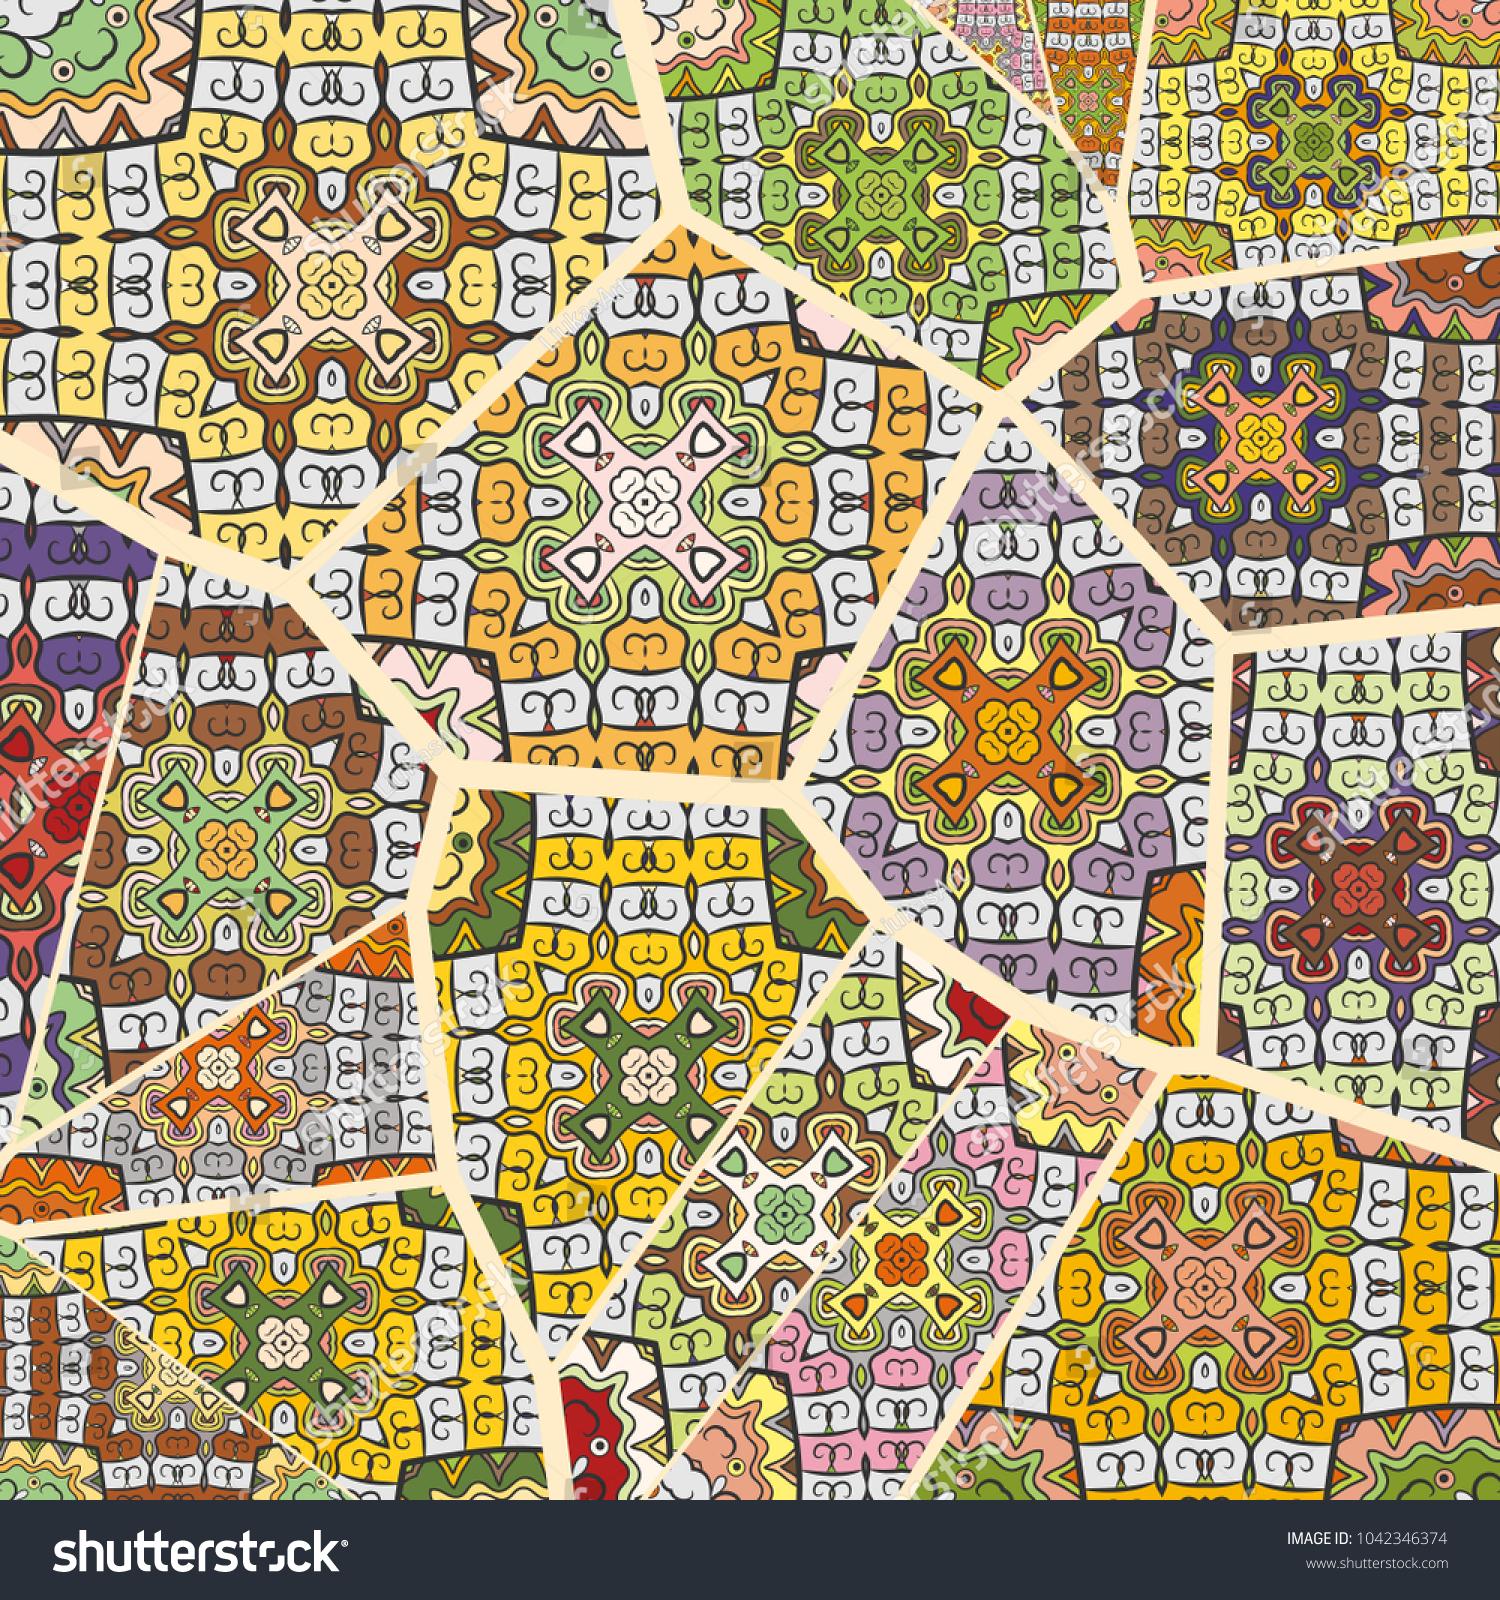 Vector patchwork quilt pattern vintage decorative stock vector vector patchwork quilt pattern vintage decorative elements hand drawn background indian arabic gumiabroncs Gallery